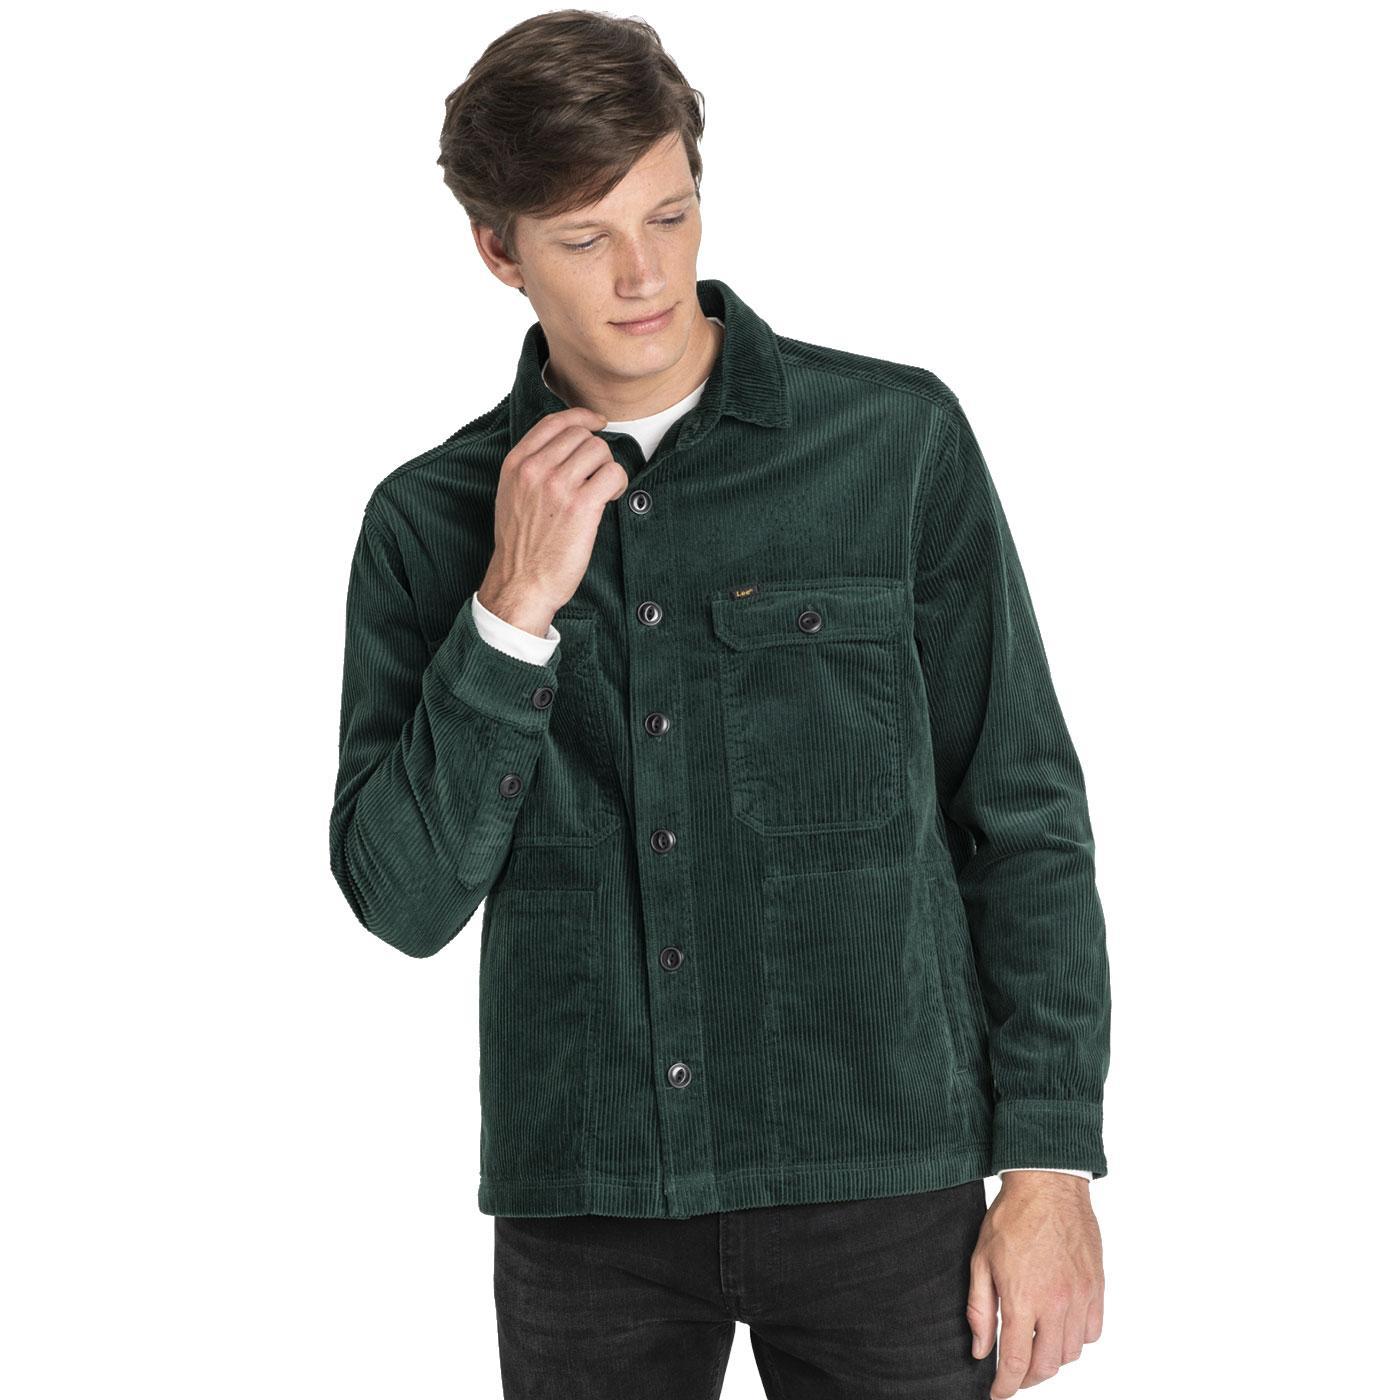 LEE JEANS Mens Retro Jumbo Cord Overshirt Jacket P